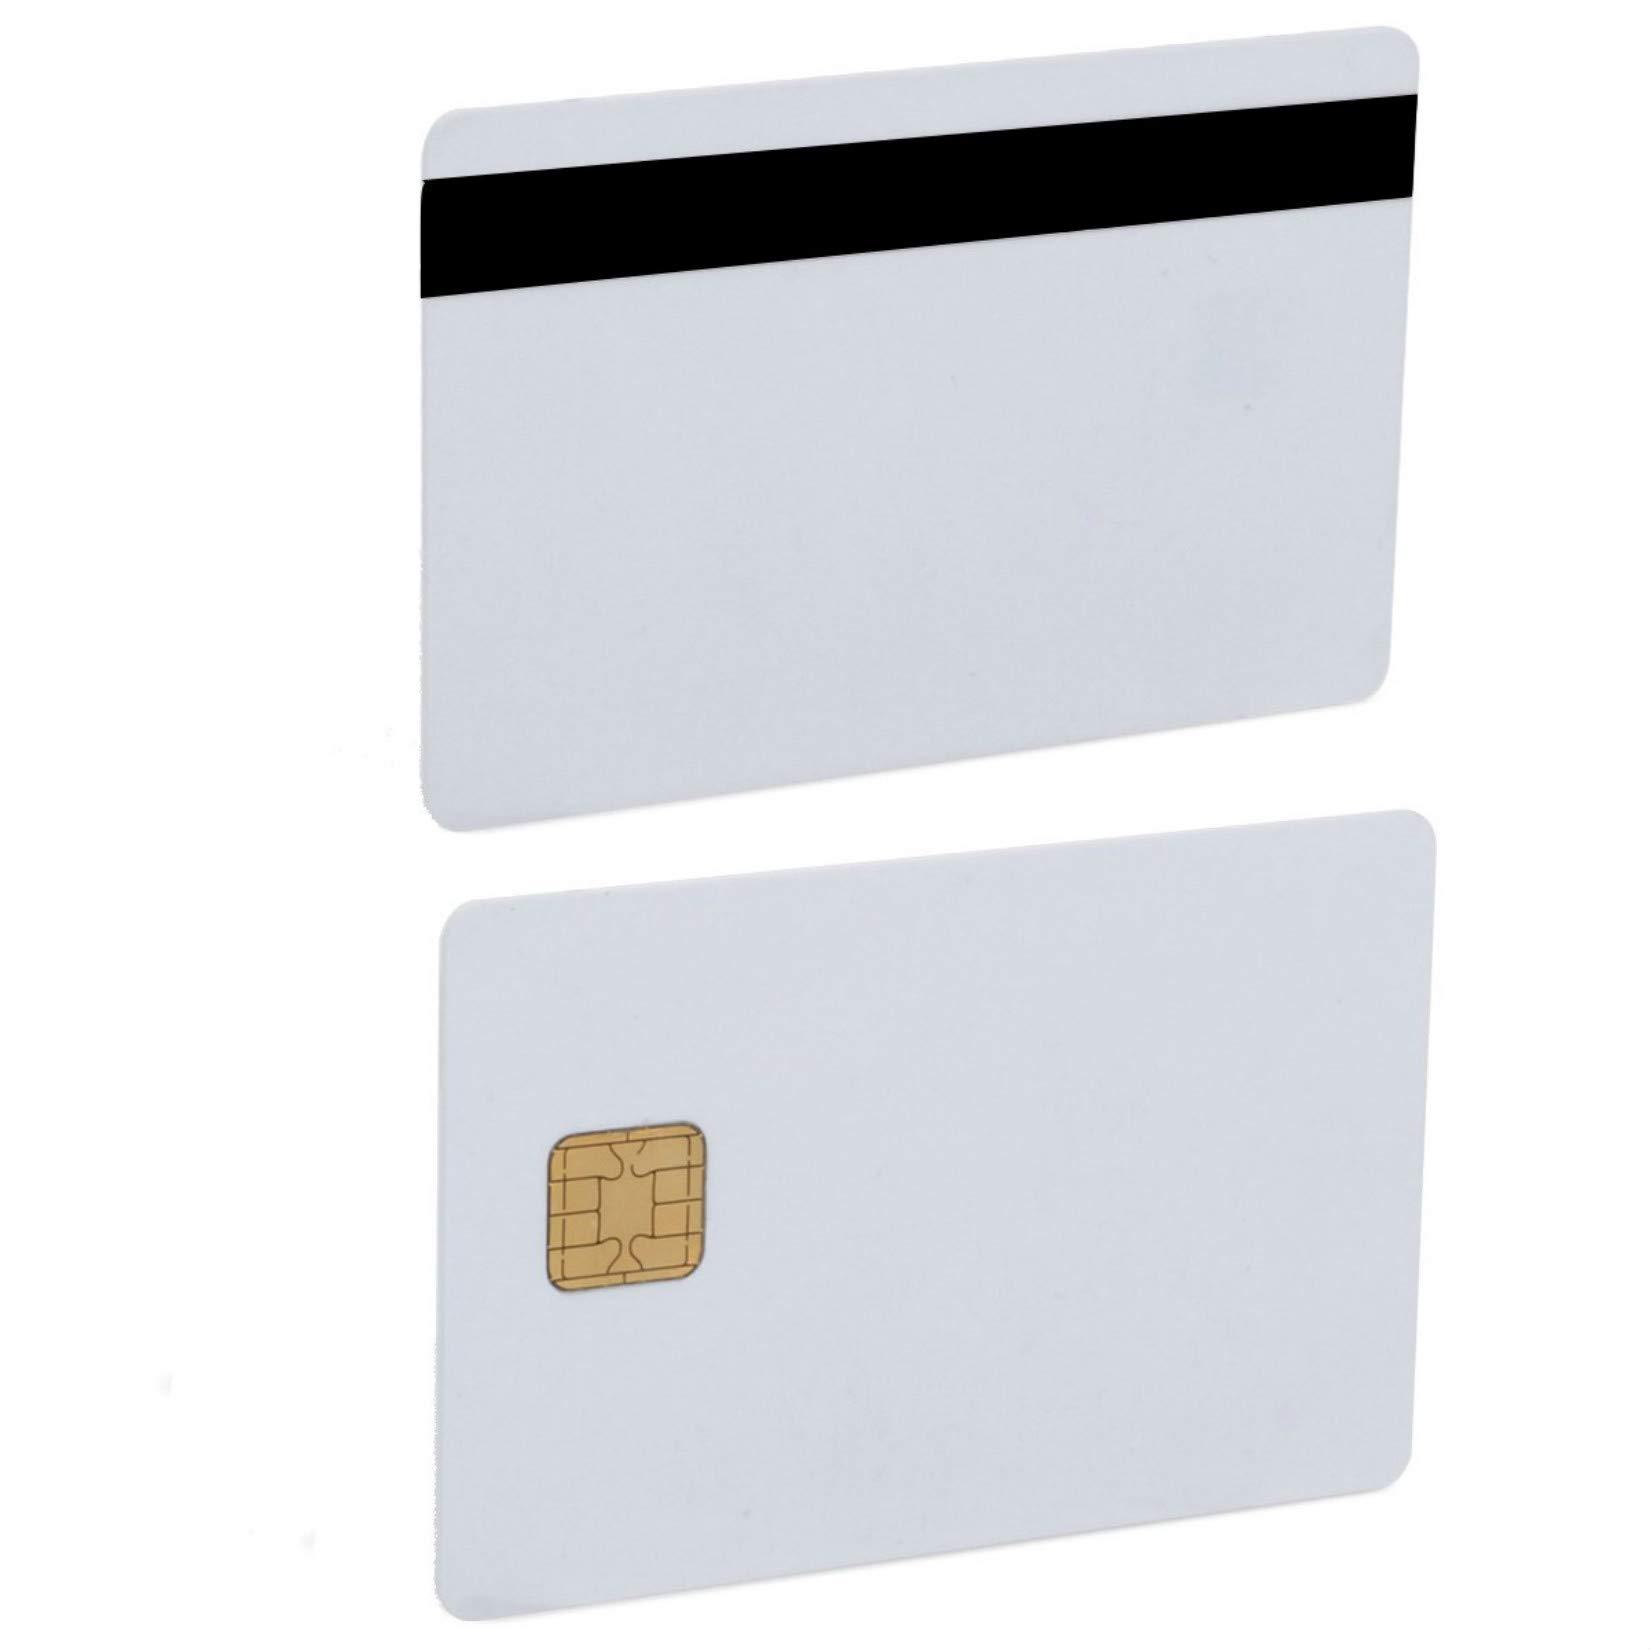 J2A040 Java JCOP Chip Cards JCOP21-40K Java Smart Card with 2 Track 8.4mm HICO Magnetic Stripe (1 Pack)